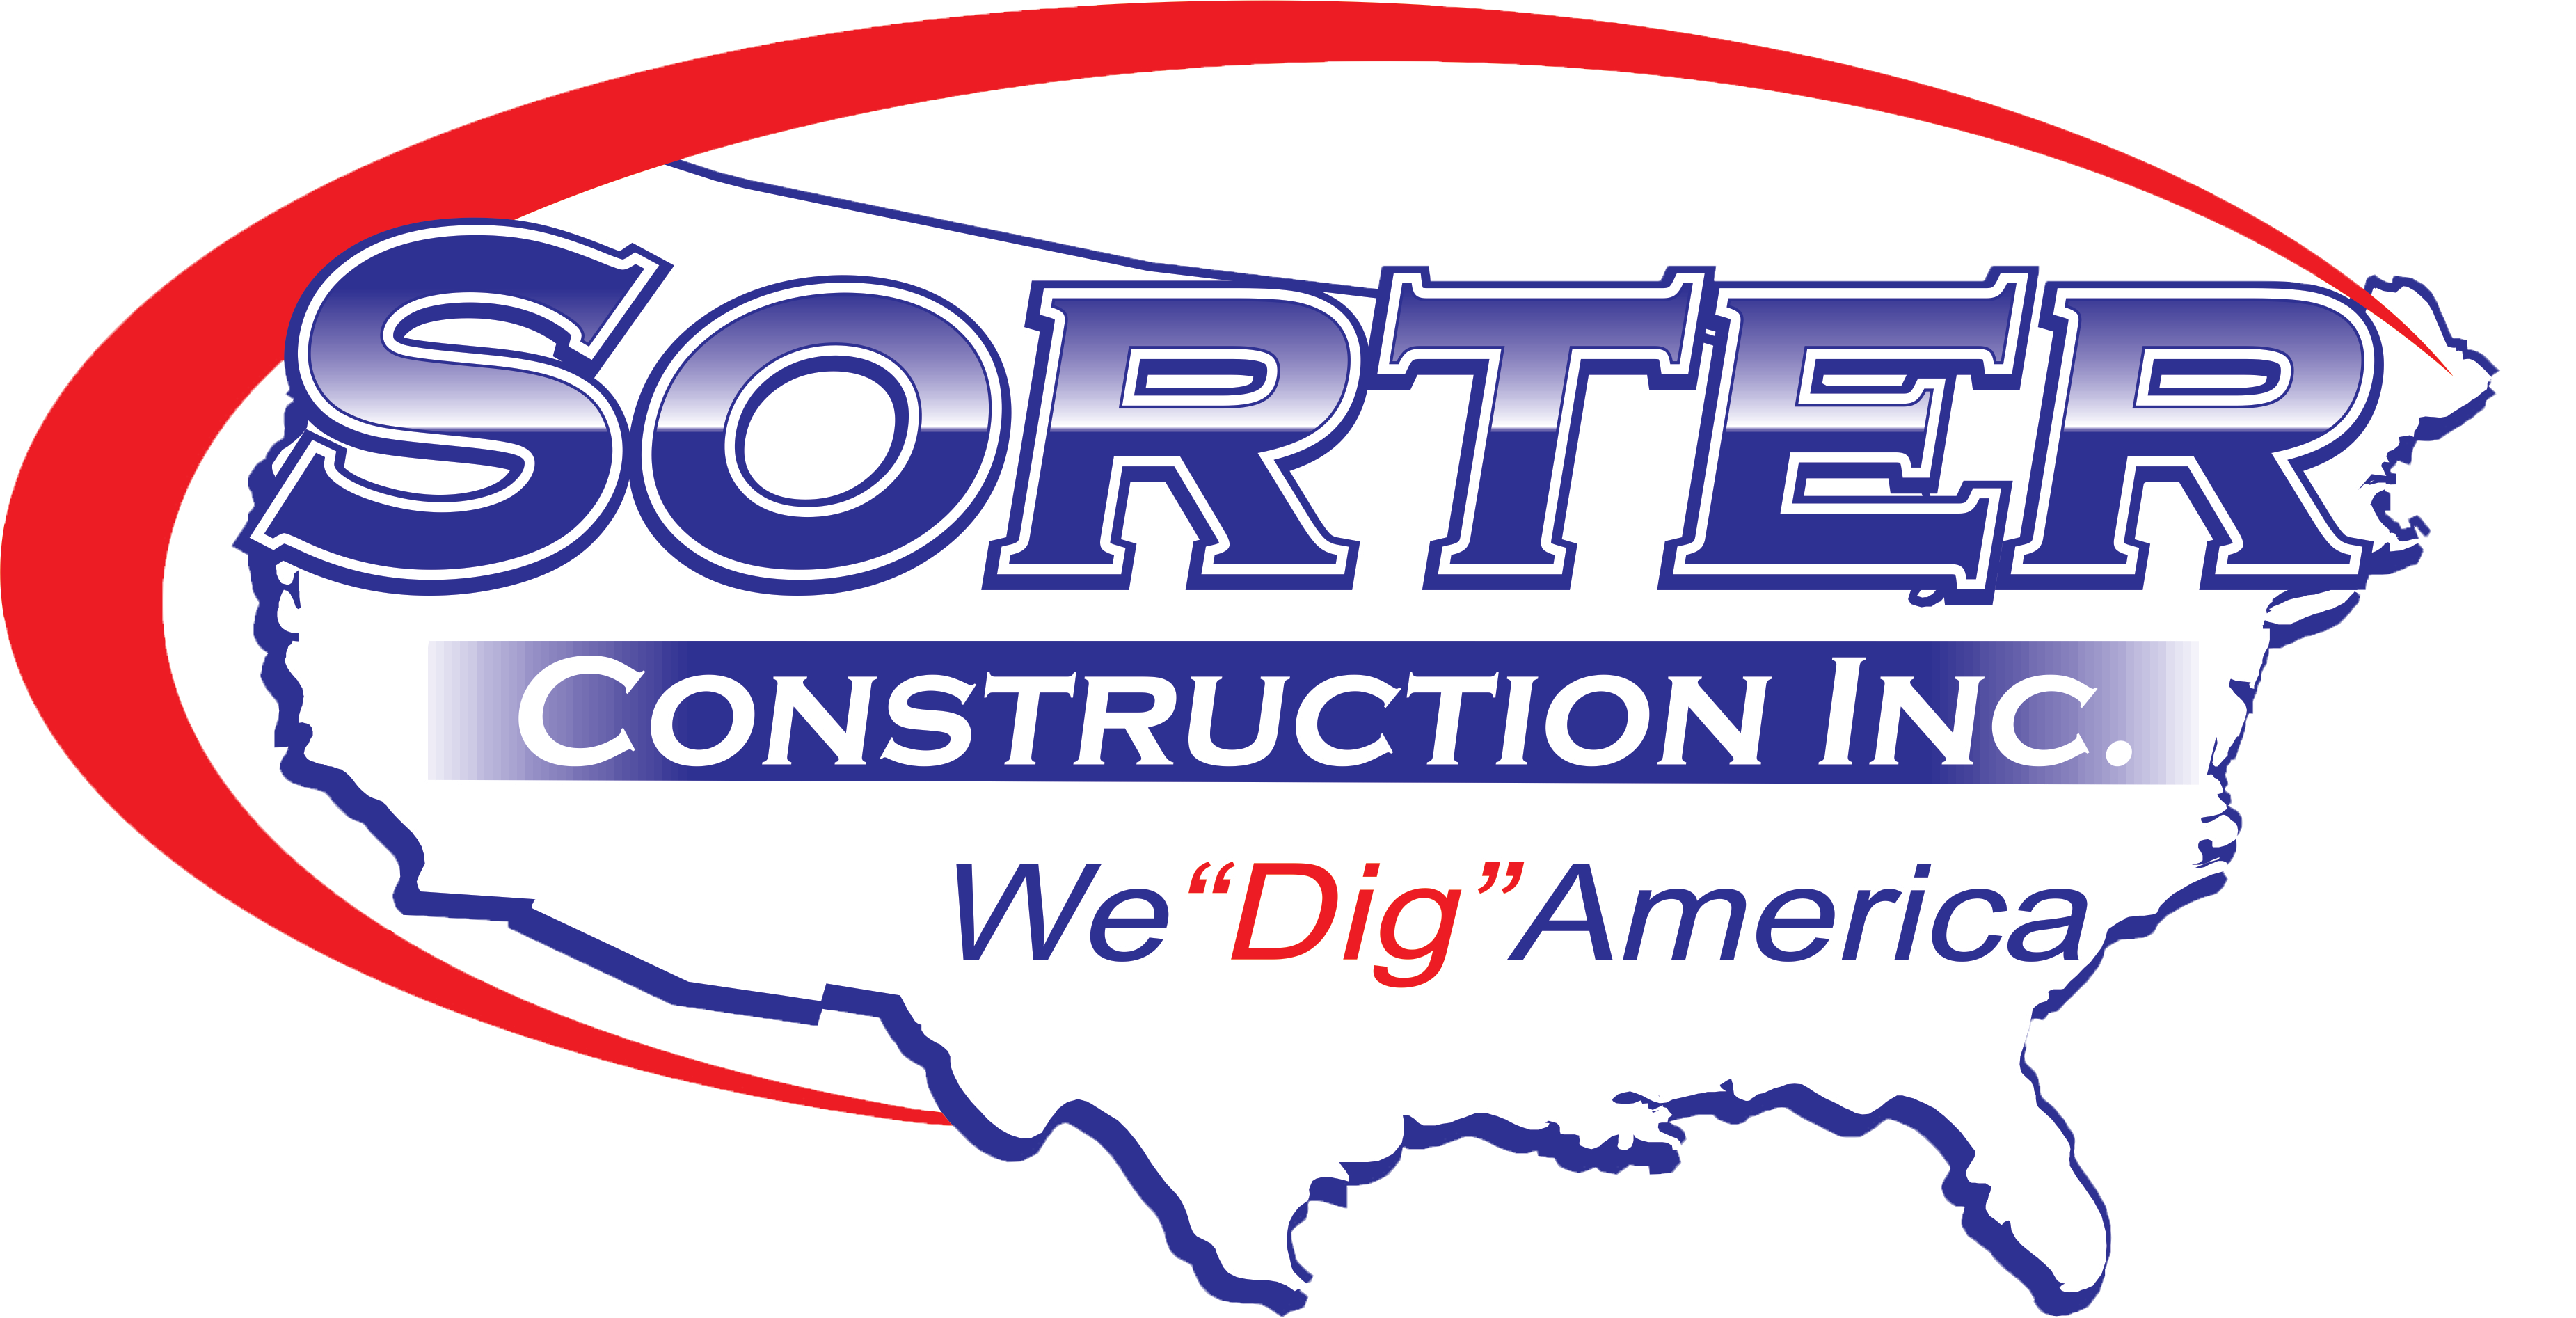 Sorter Construction